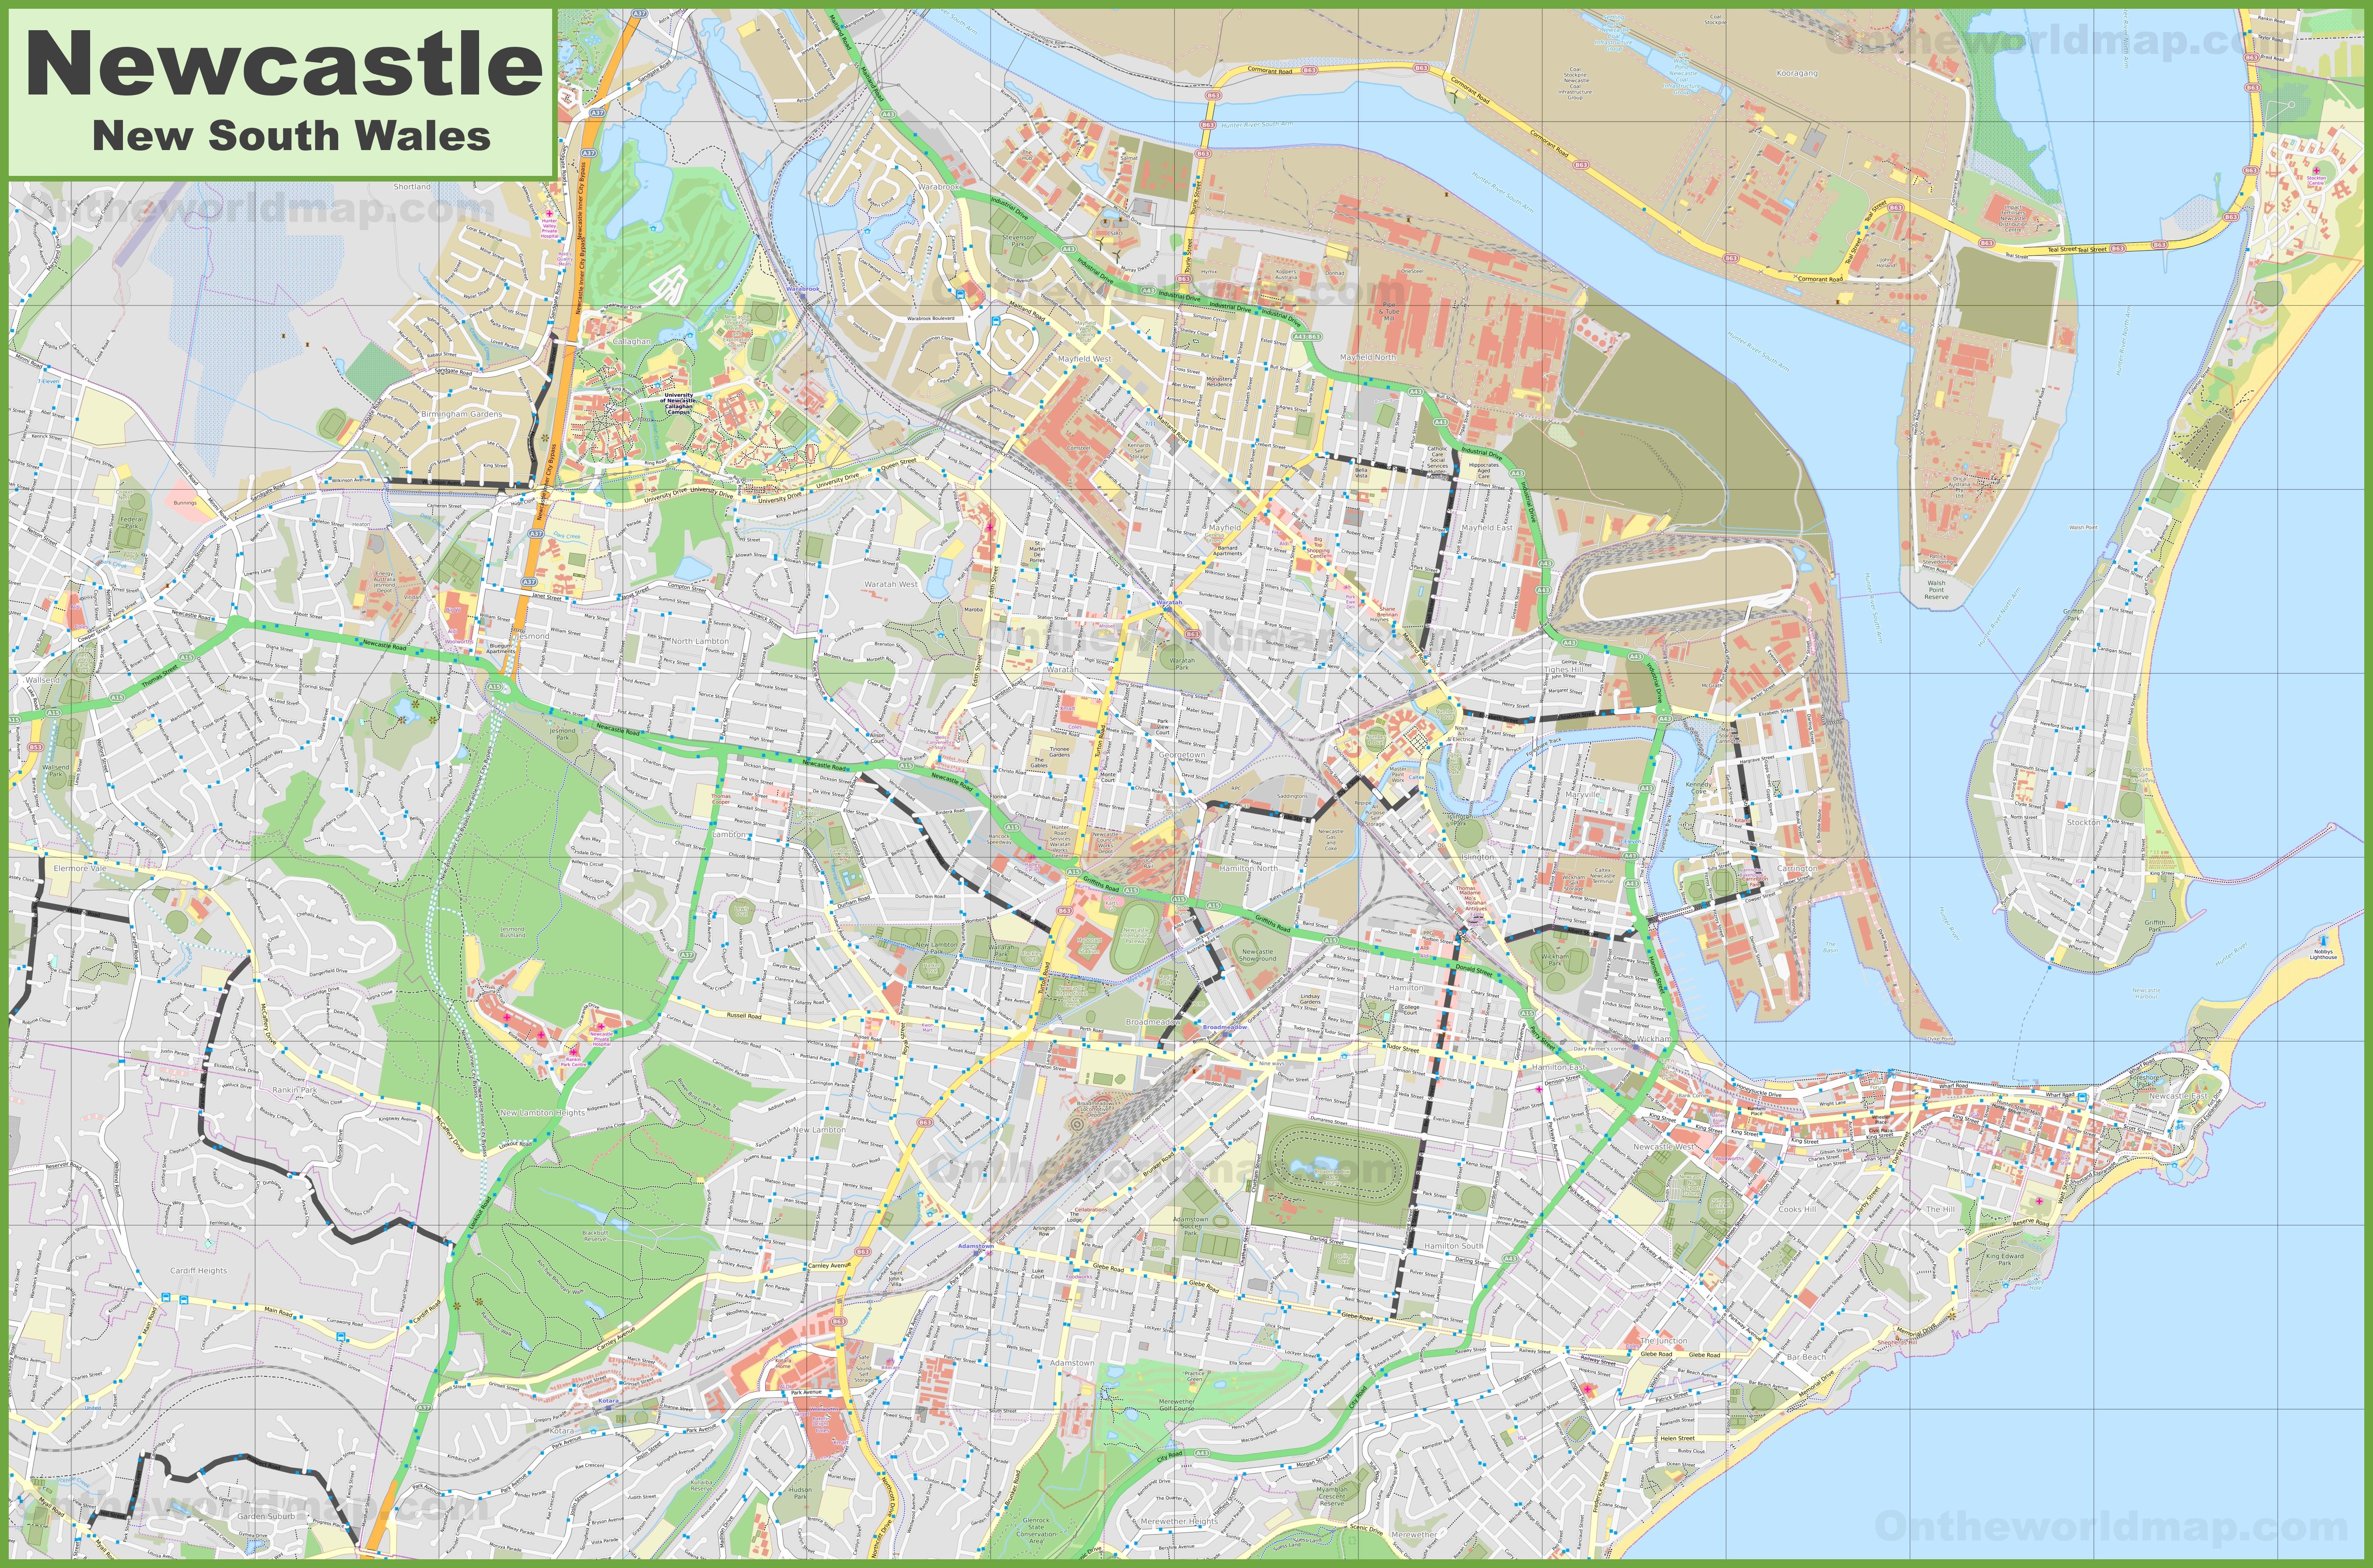 Australia Map Newcastle.Large Detailed Map Of Newcastle